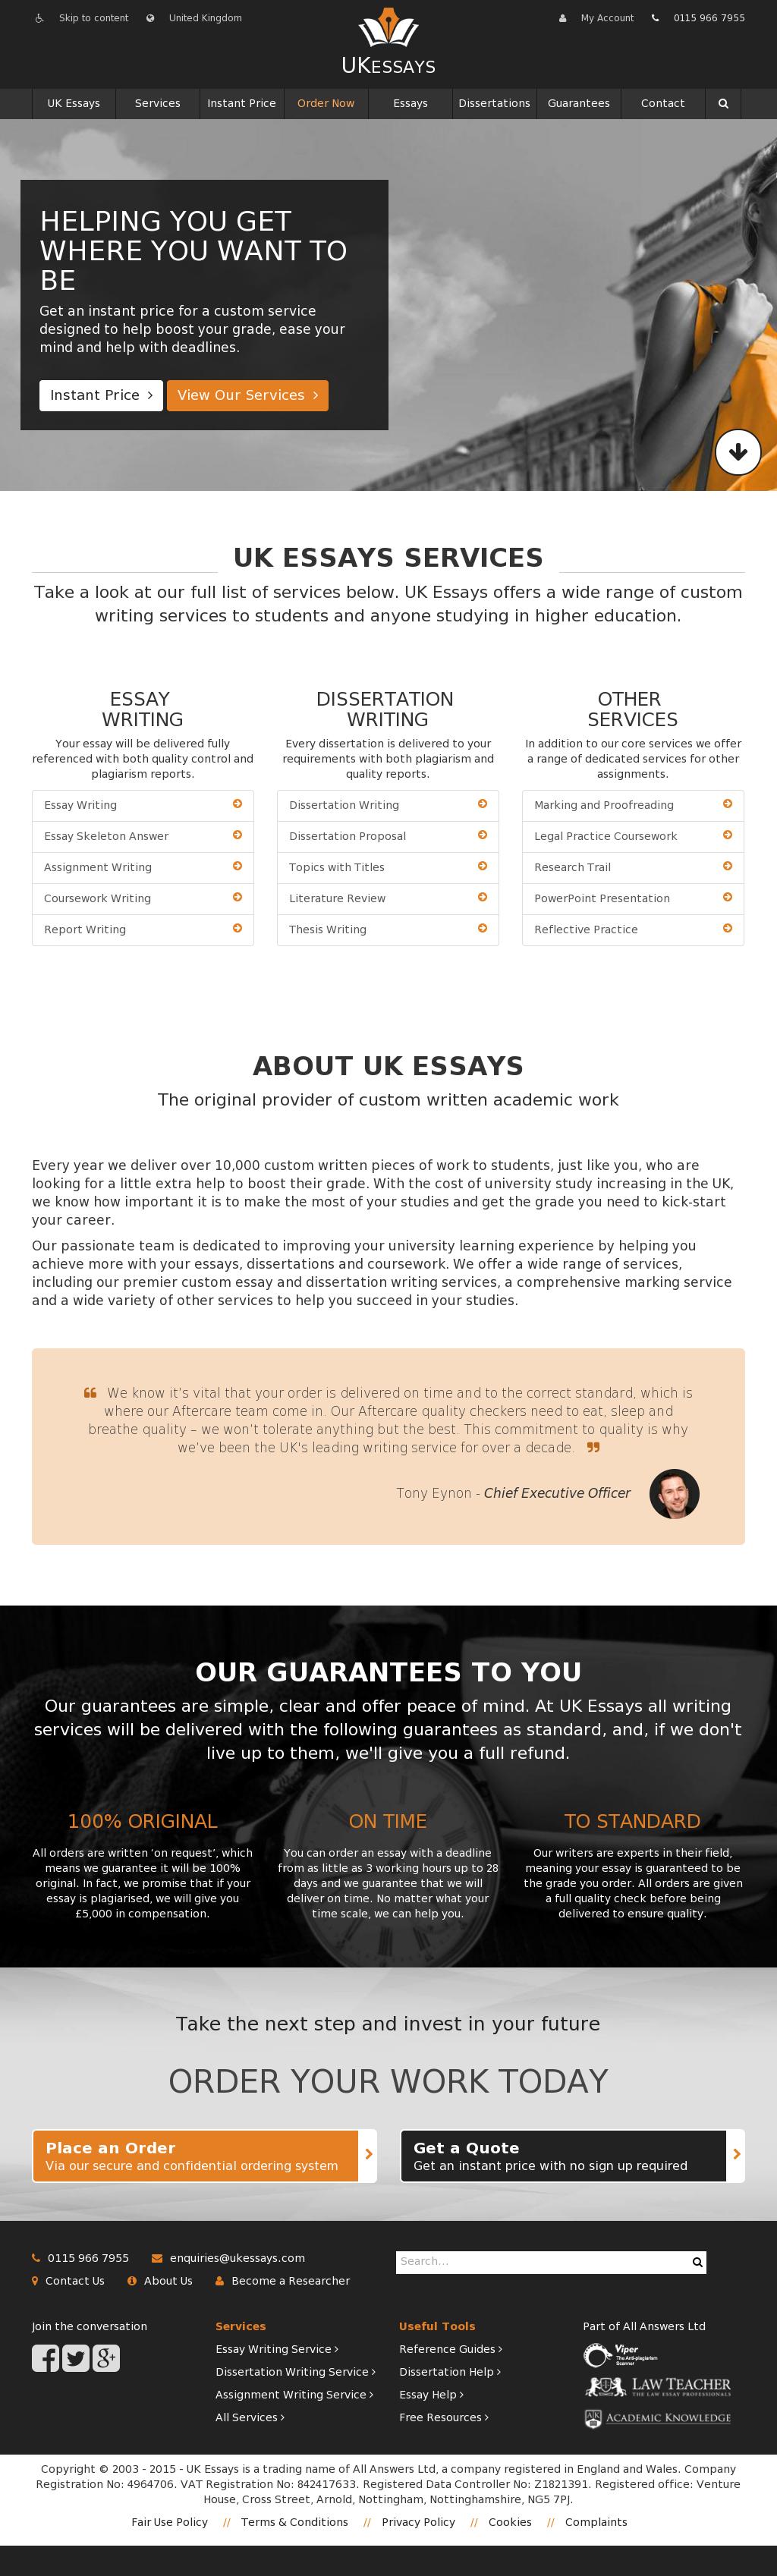 uk essays 2015